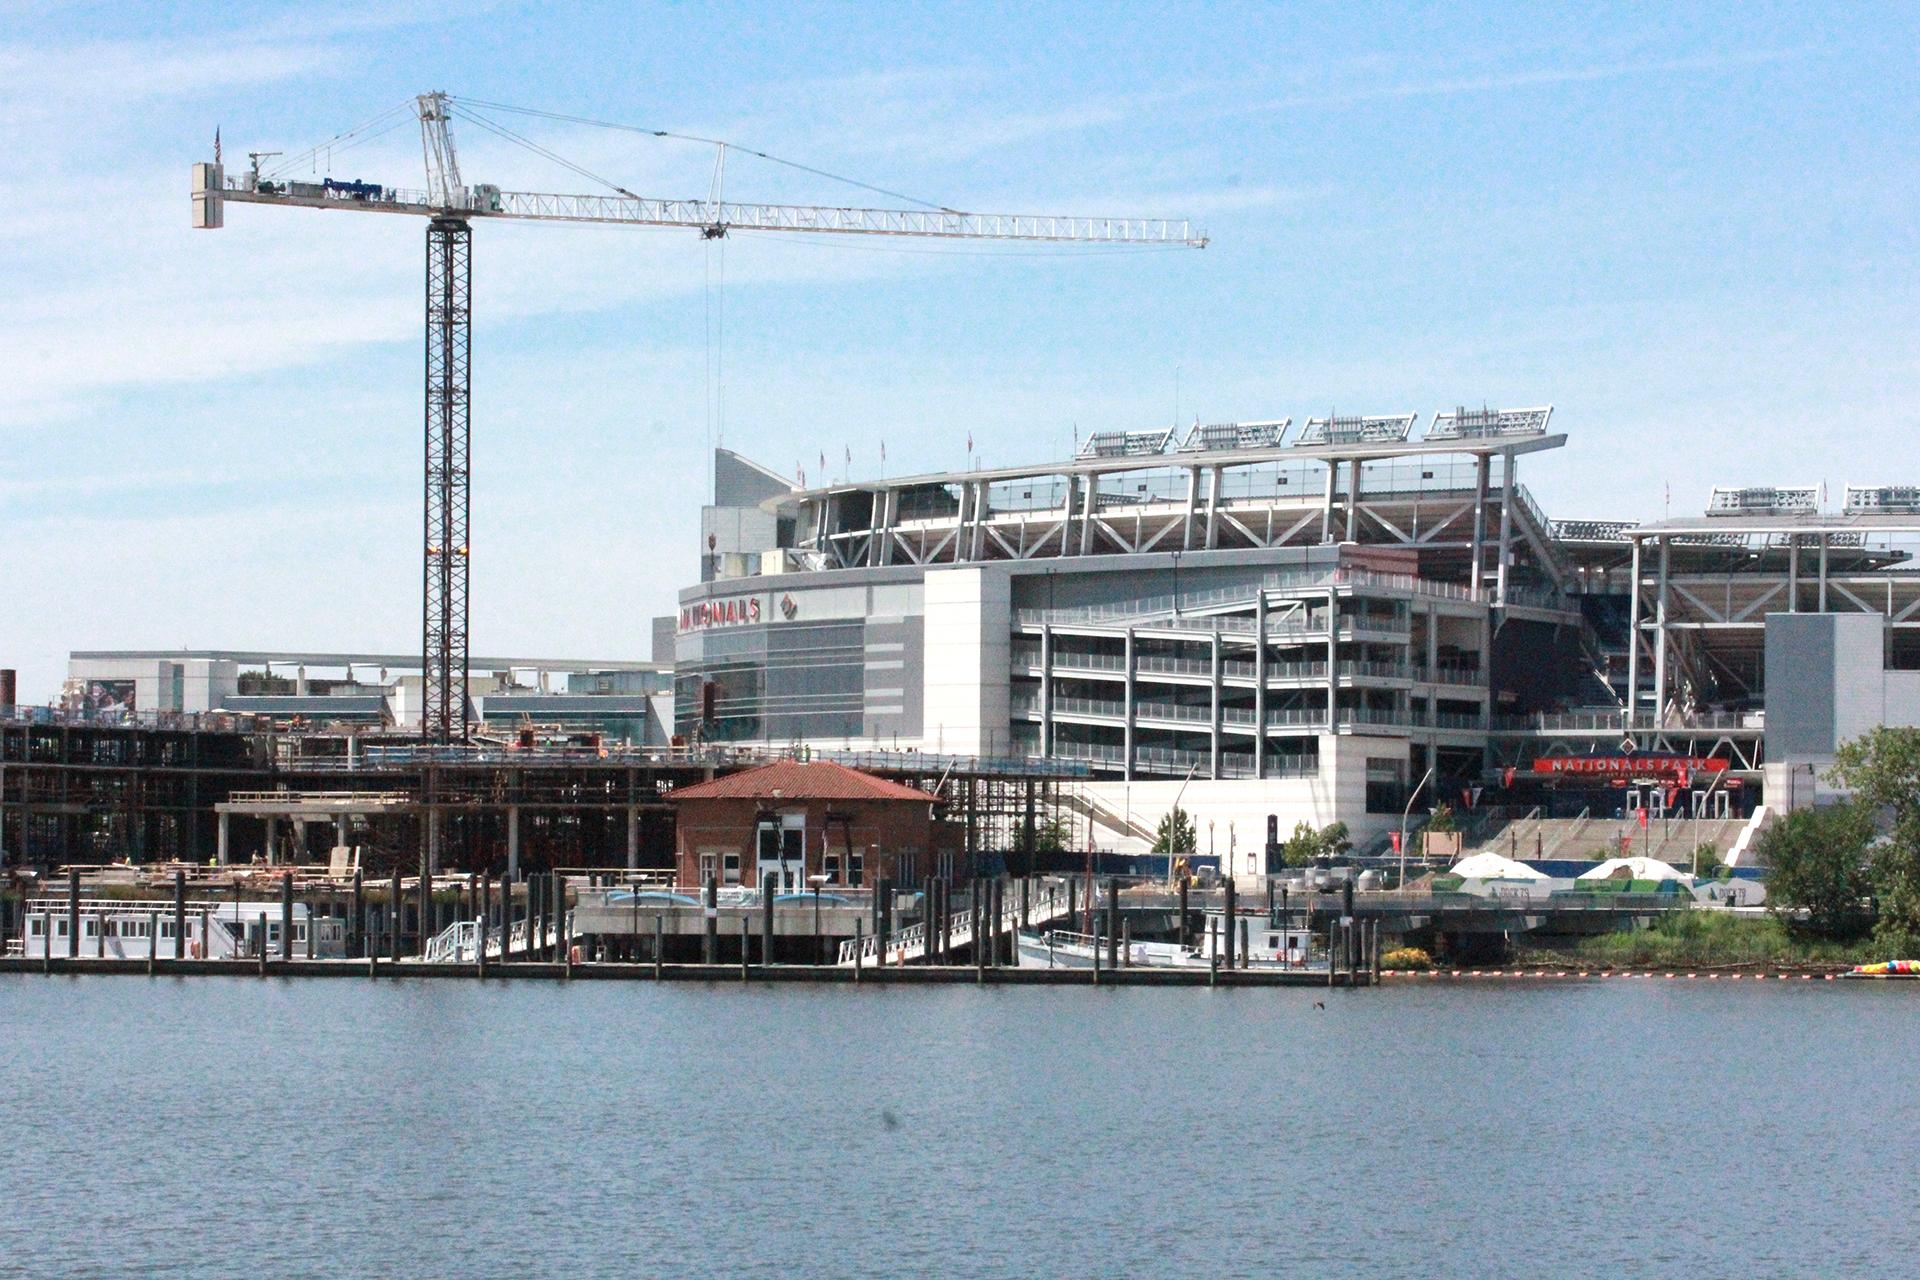 Cranes still dominate the sky near Nationals Stadium.